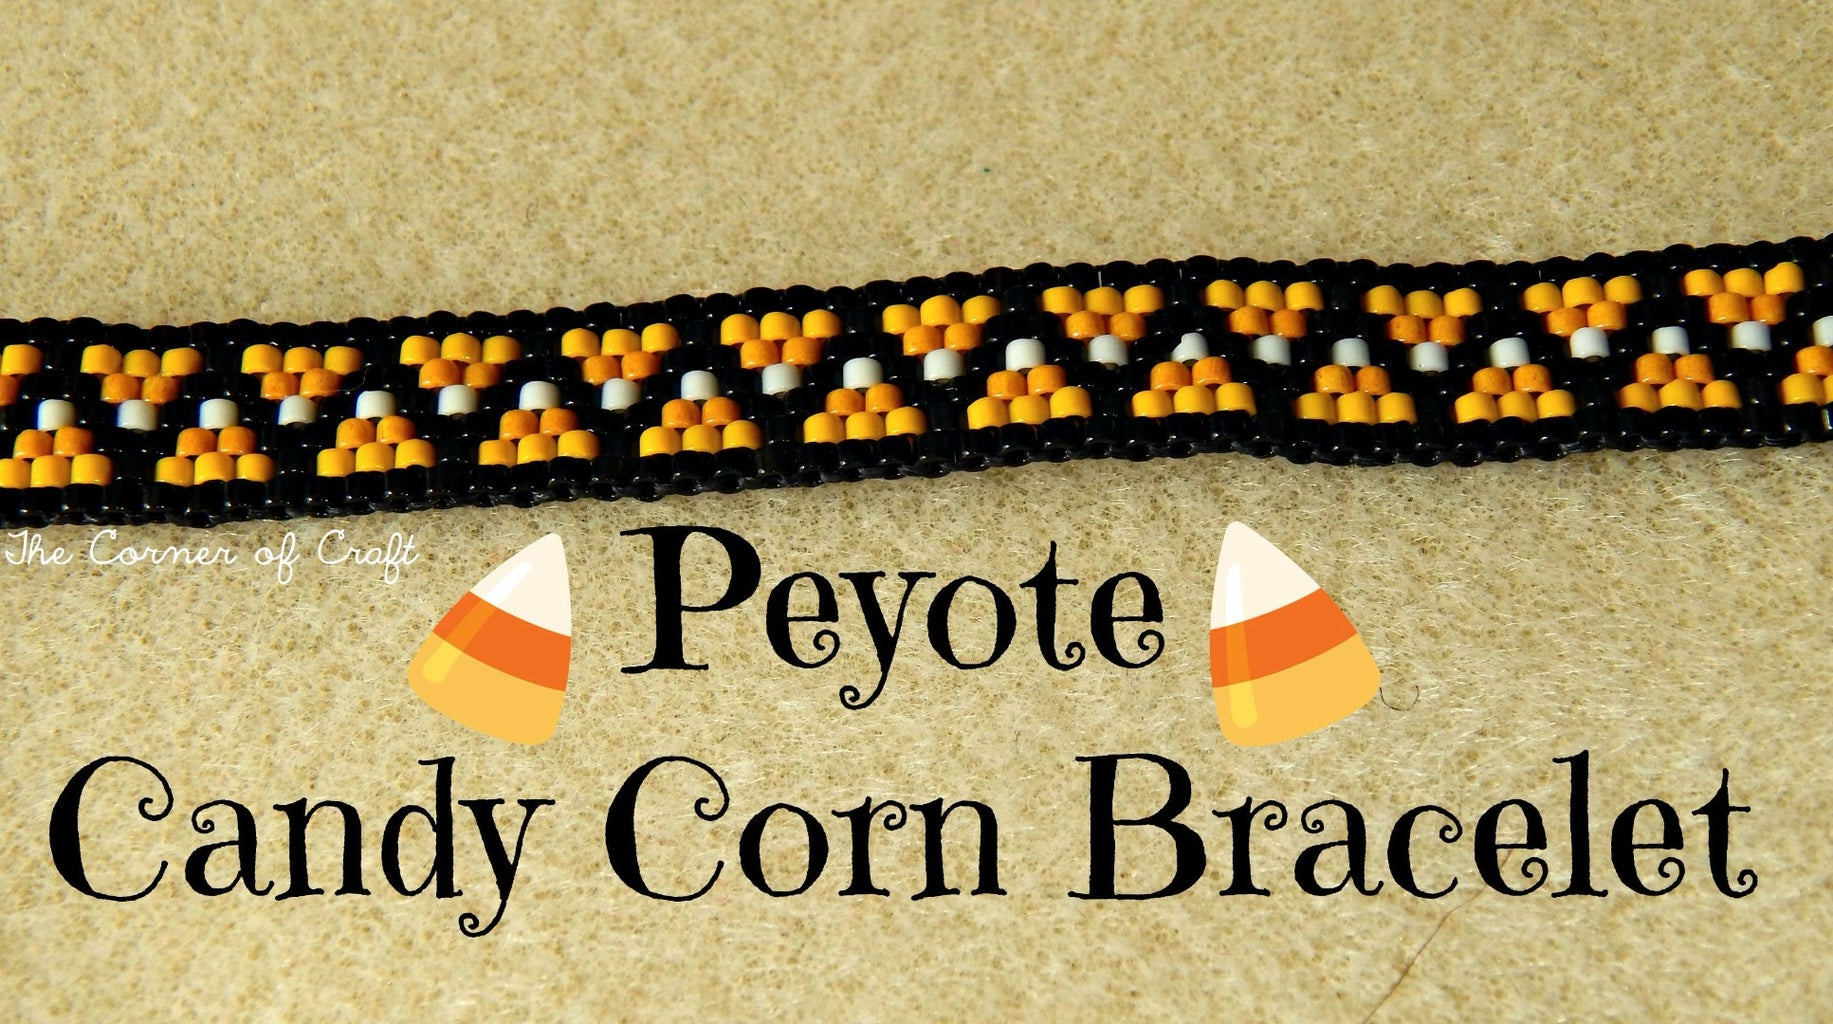 Candy Corn Beaded Bracelet ¦ the Corner of Craft